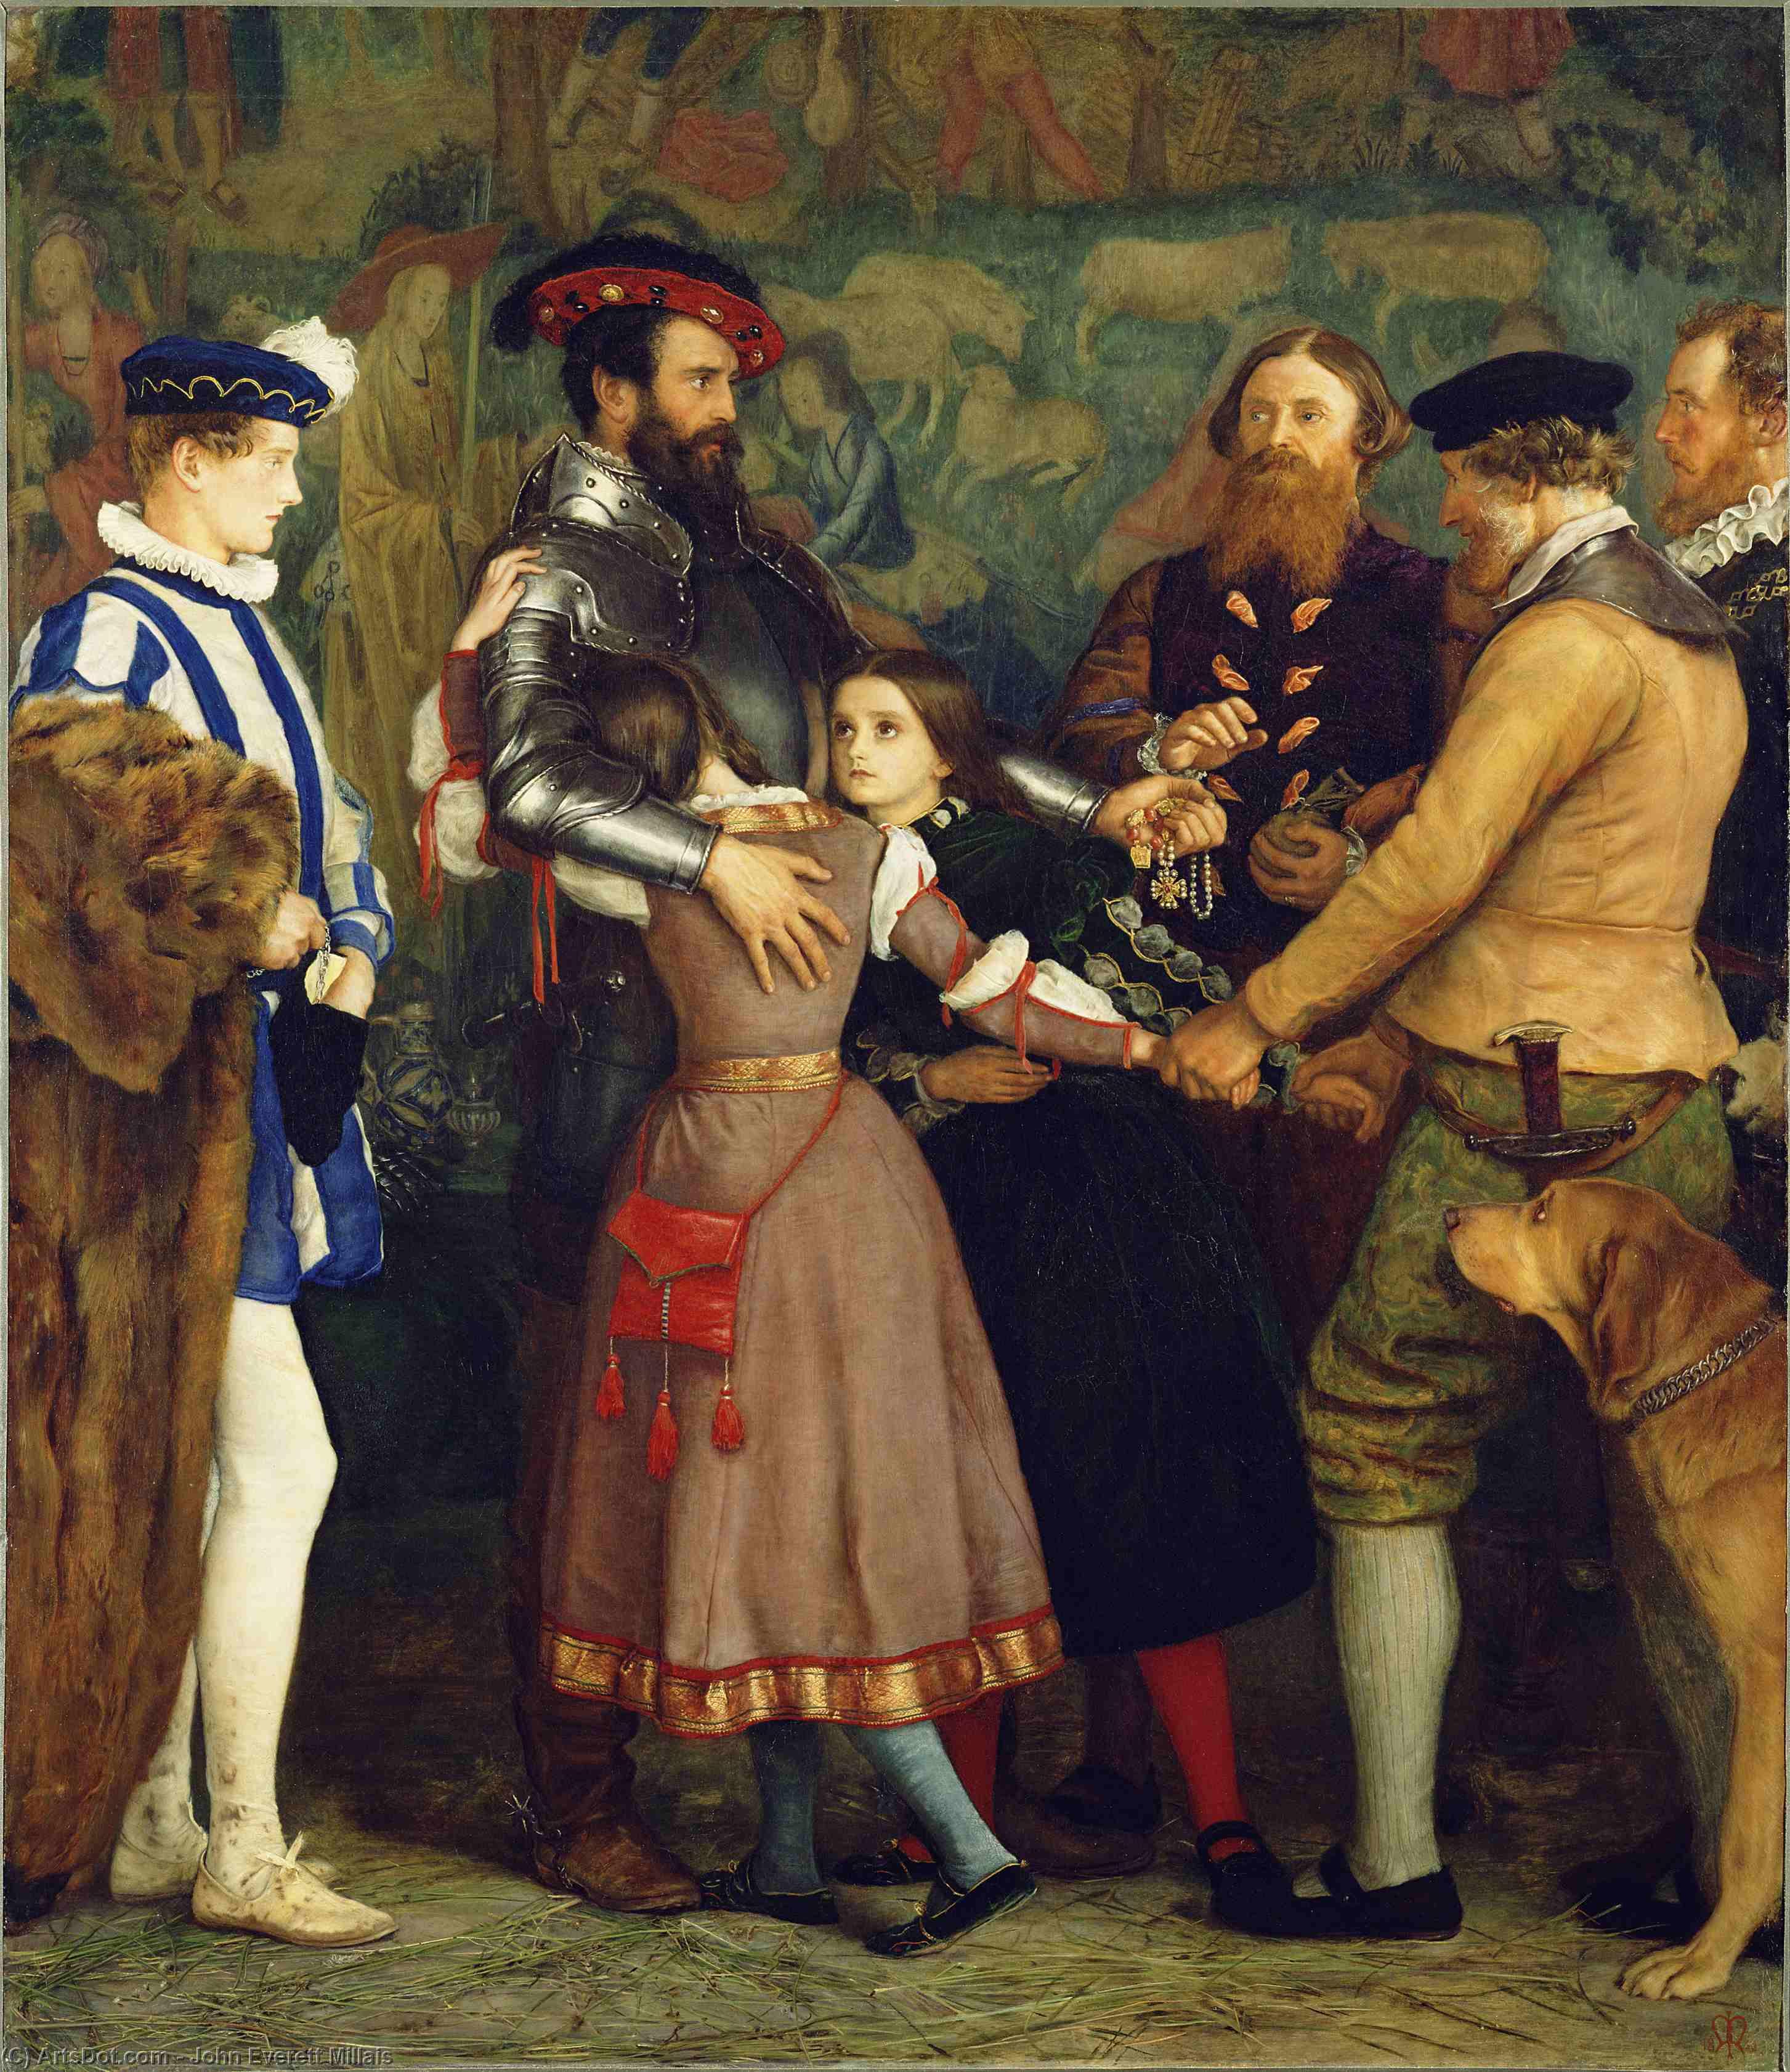 Wikioo.org - The Encyclopedia of Fine Arts - Painting, Artwork by John Everett Millais - The Ransom